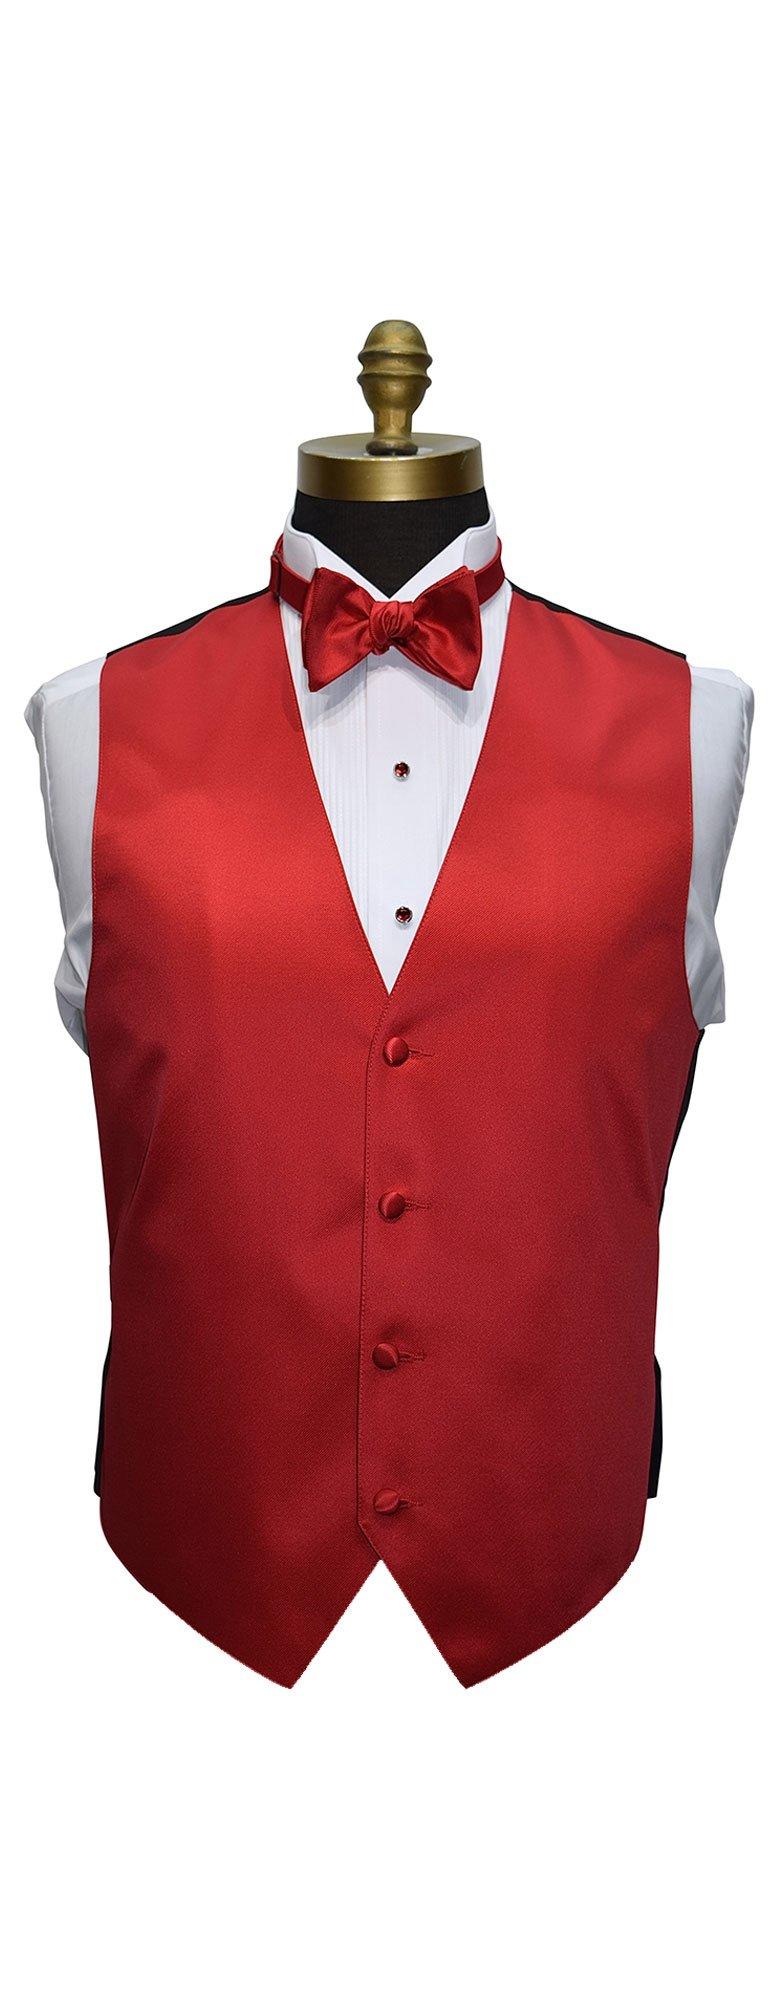 Valentina Ruby Red Tuxedo Vest Only